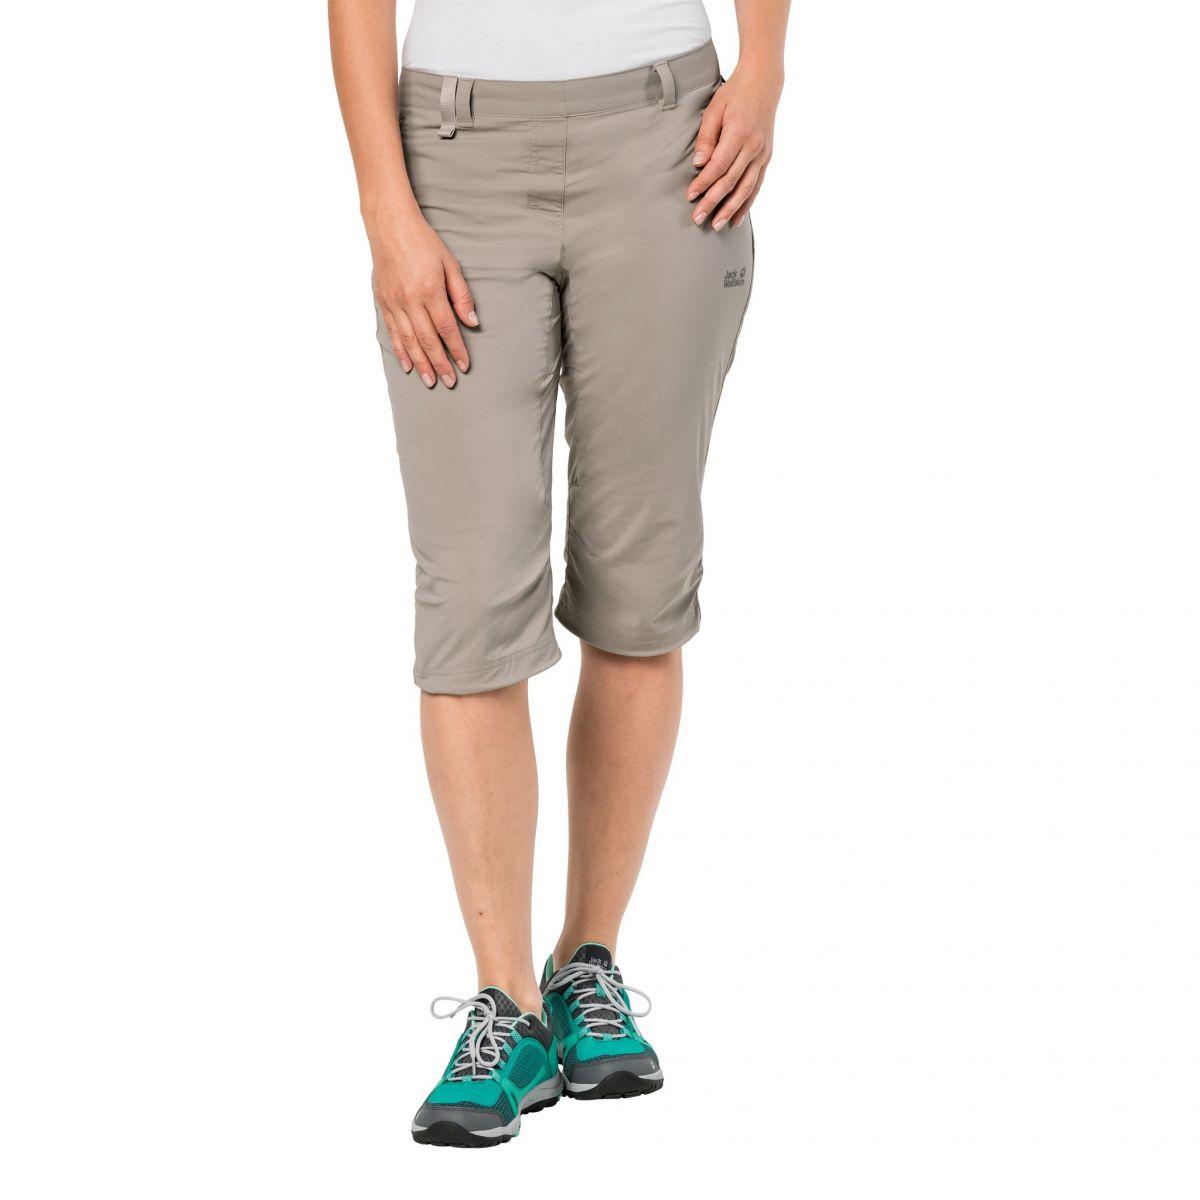 Damen Damen Activate Pants 34 Hose EIYH2WD9